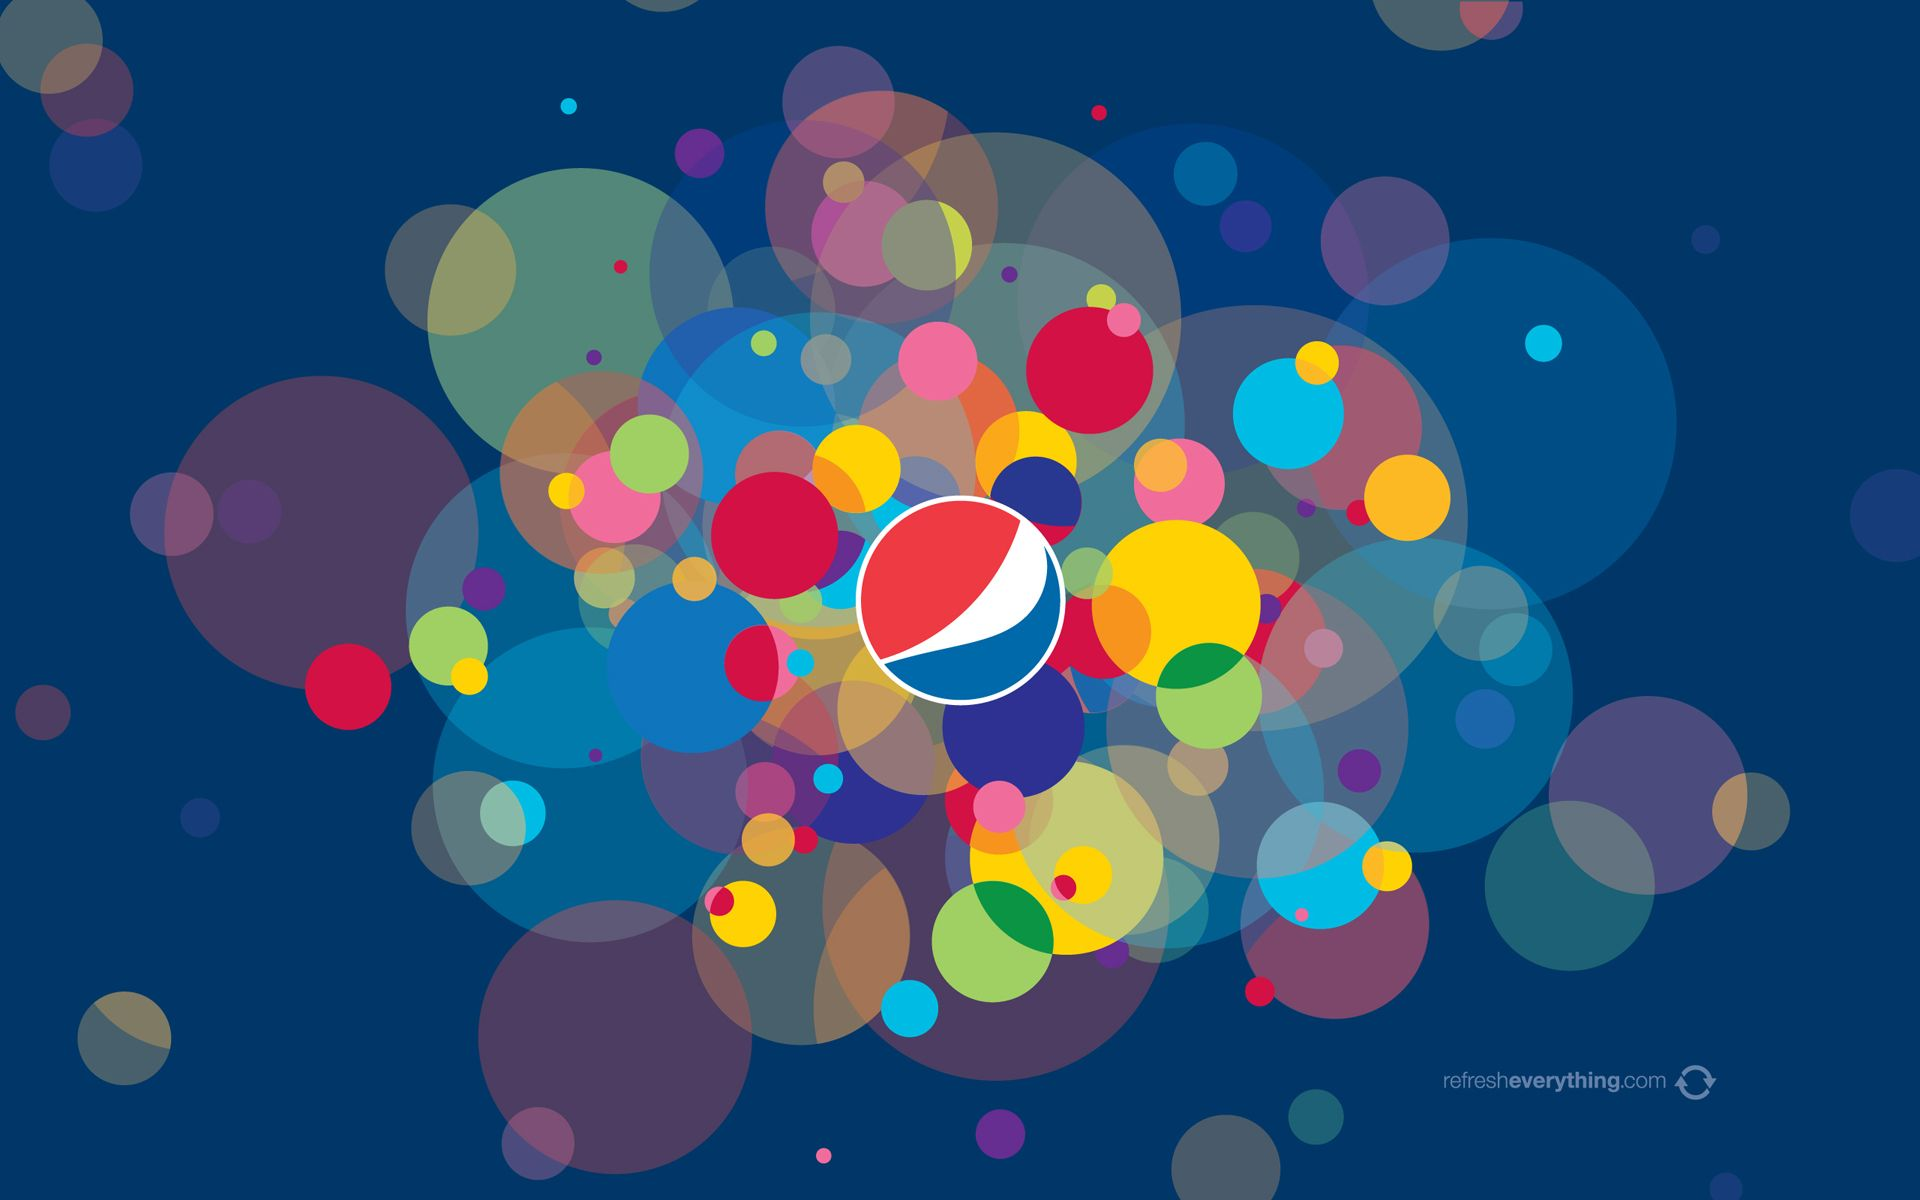 Hd Wallpapers Pepsi Logo 1024 X 768 160 Kb Jpeg HD Wallpapers 1920x1200